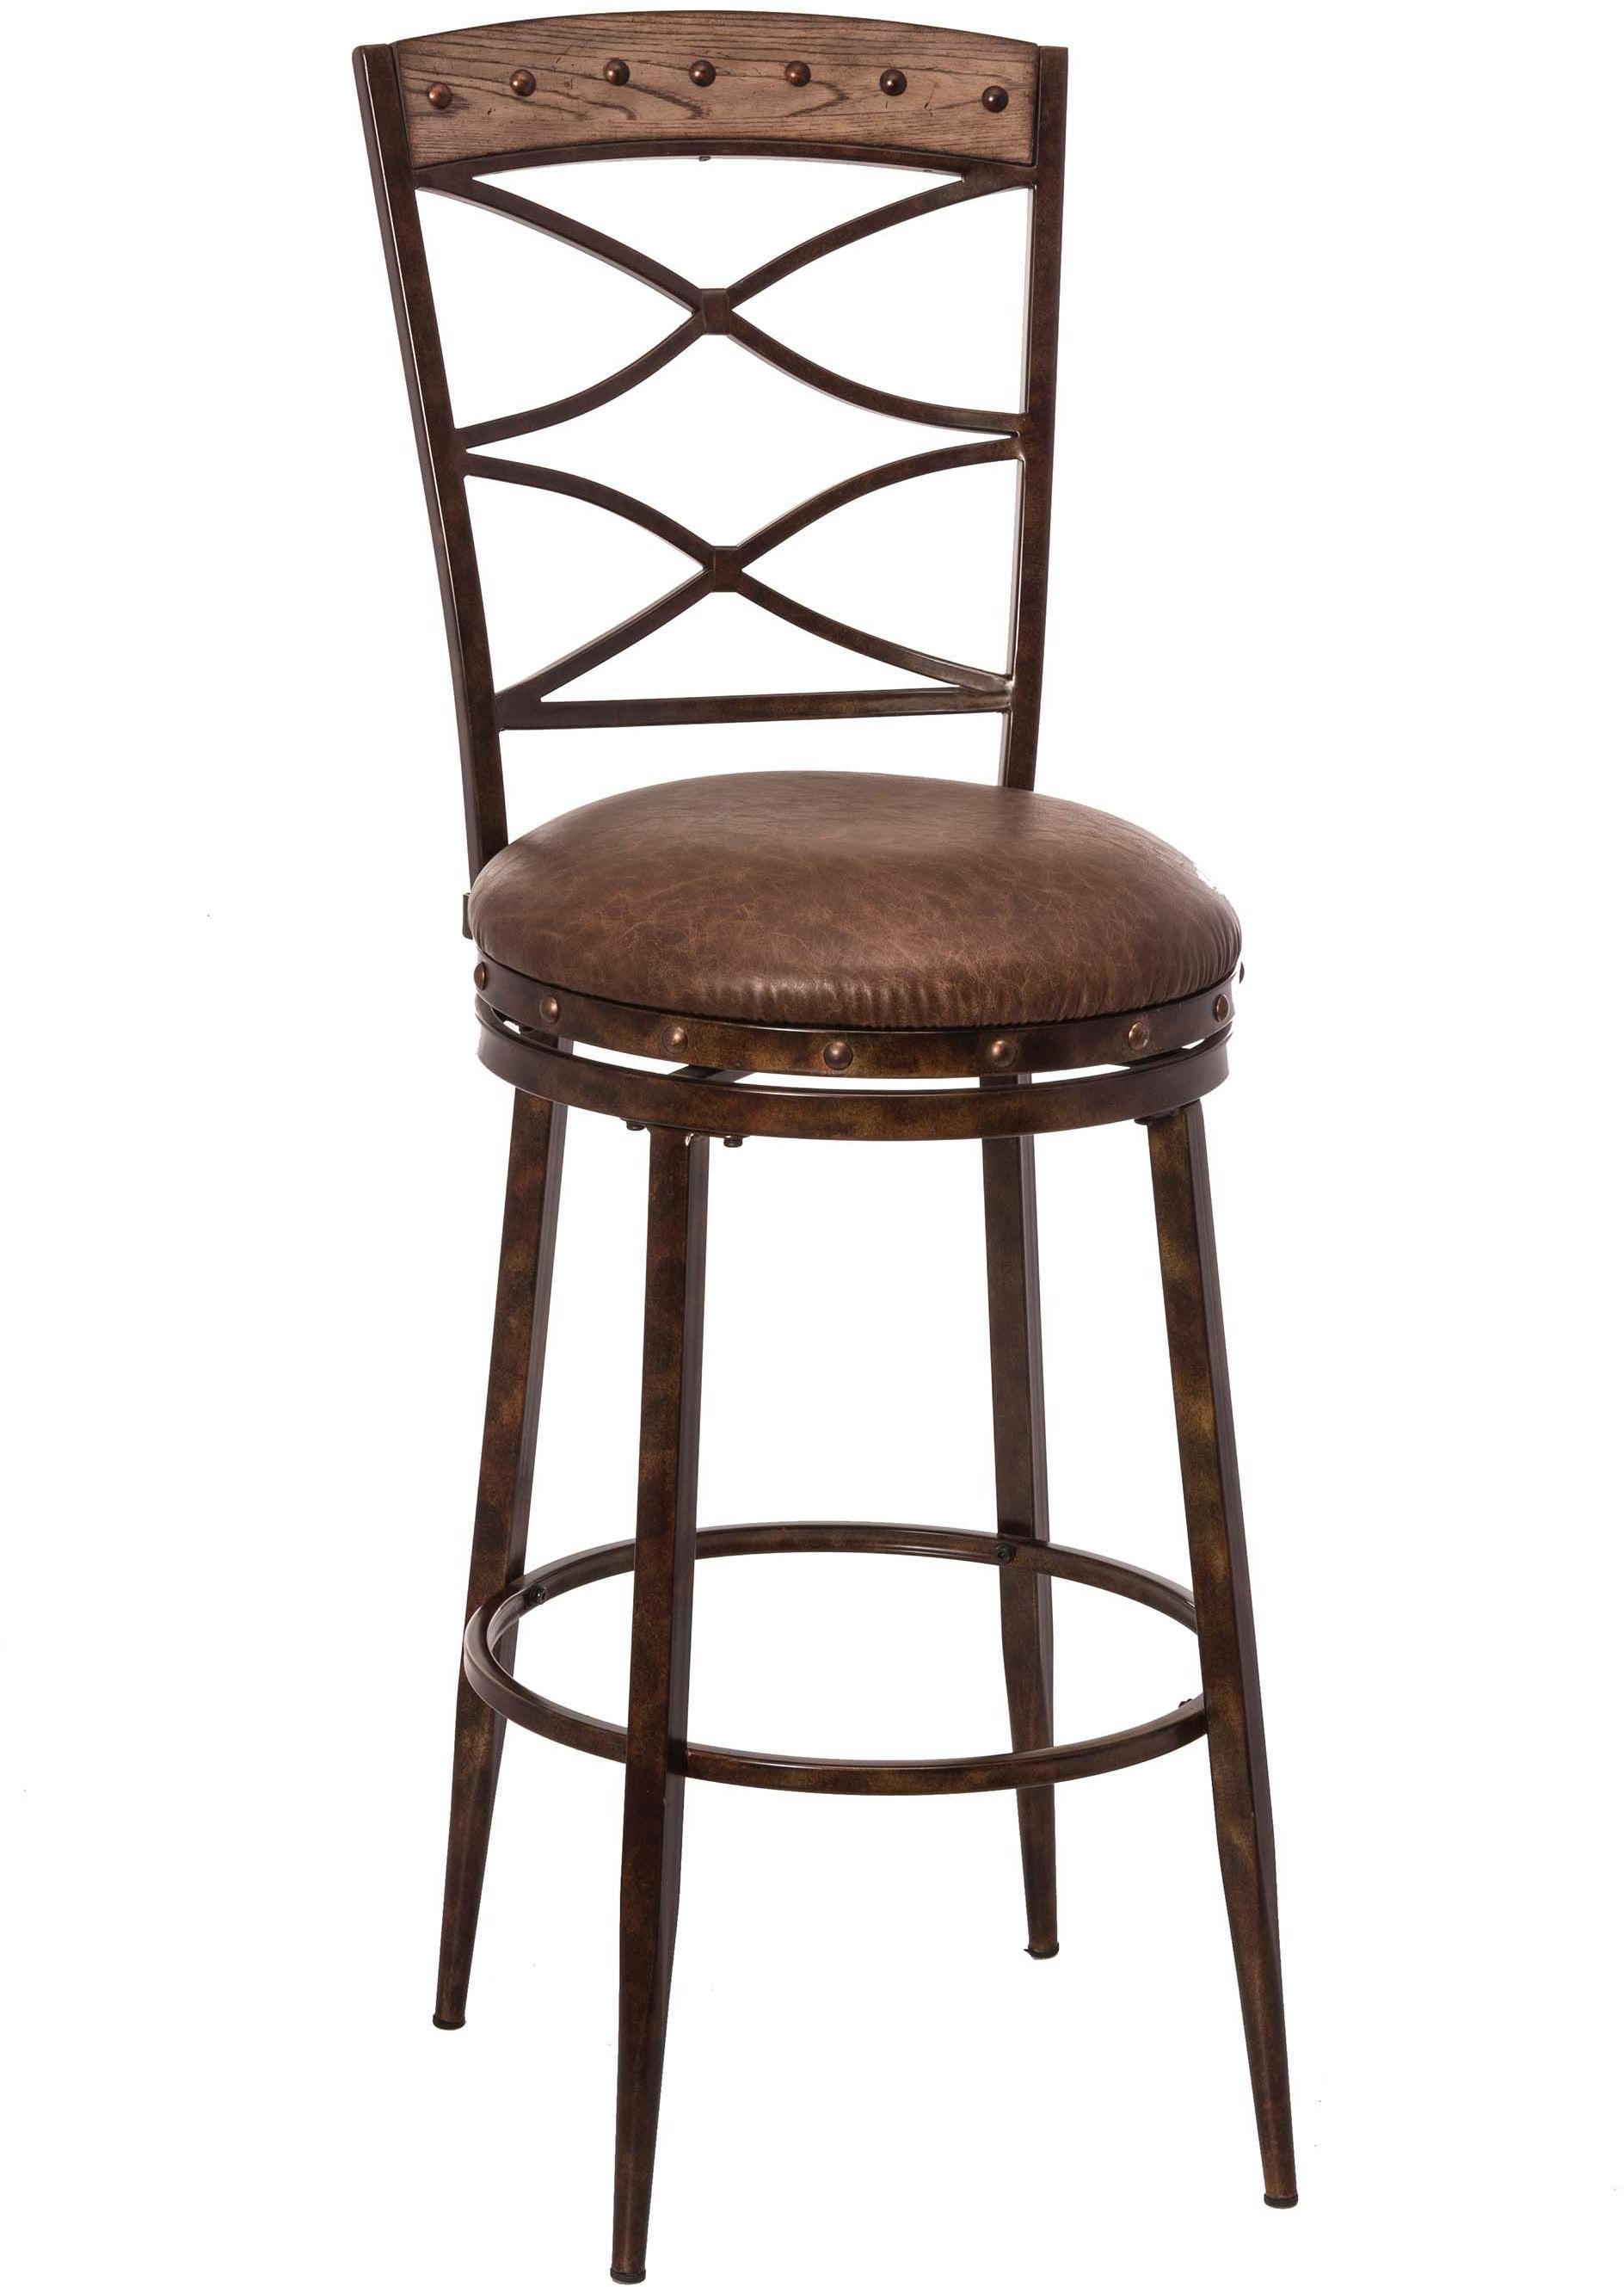 Hillsdale Furniture Emmons Swivel Bar Stool 5984 830